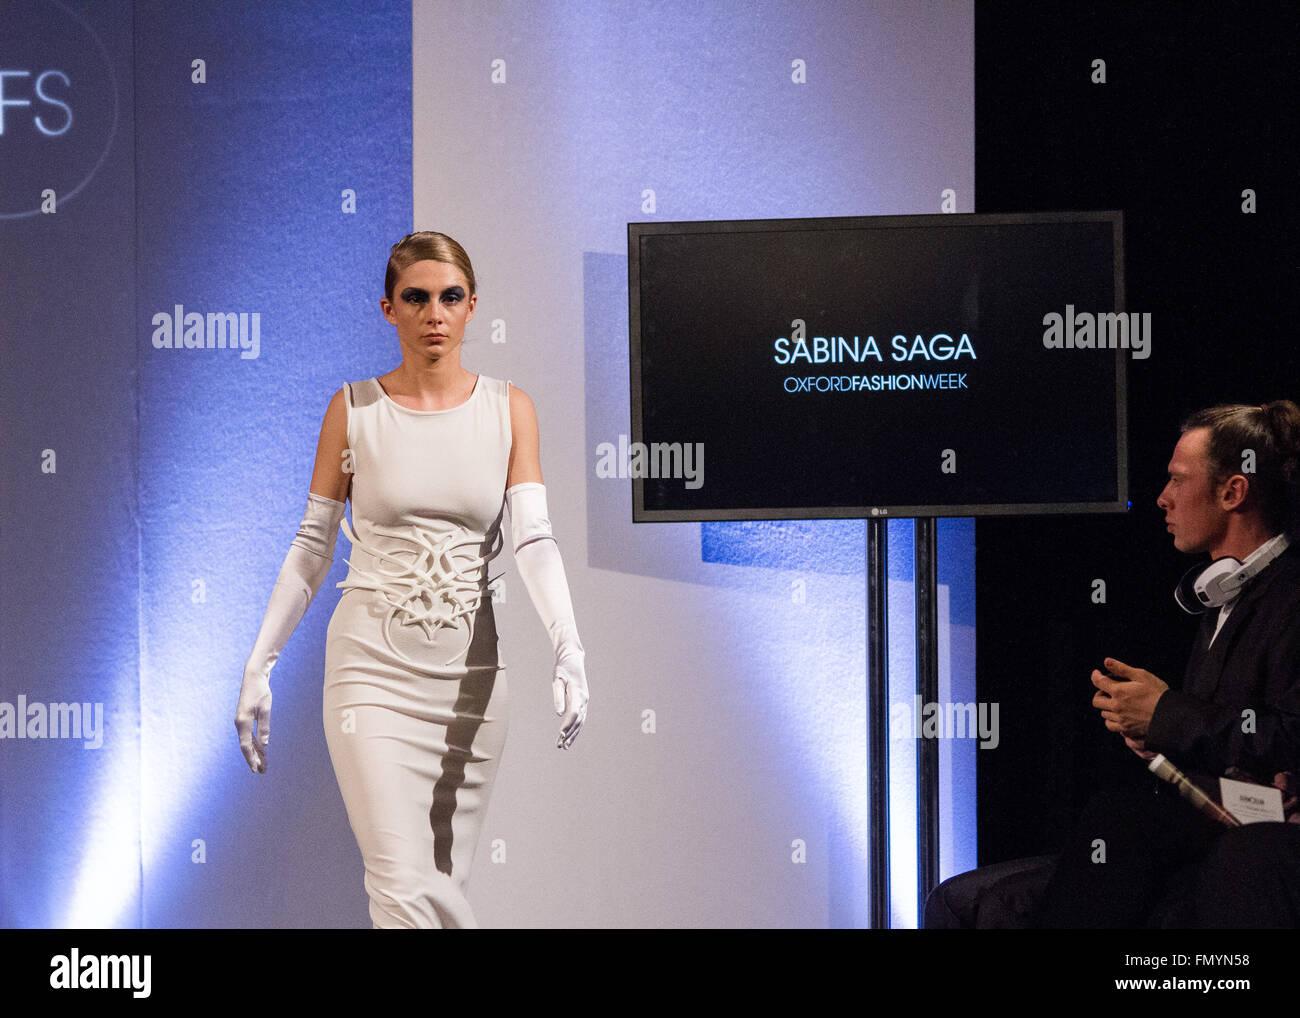 Oxford,Uk 12th March 2016. Sabina Saga Wedding Collections during the Oxford Fashion week run way show Credit: Pete - Stock Image